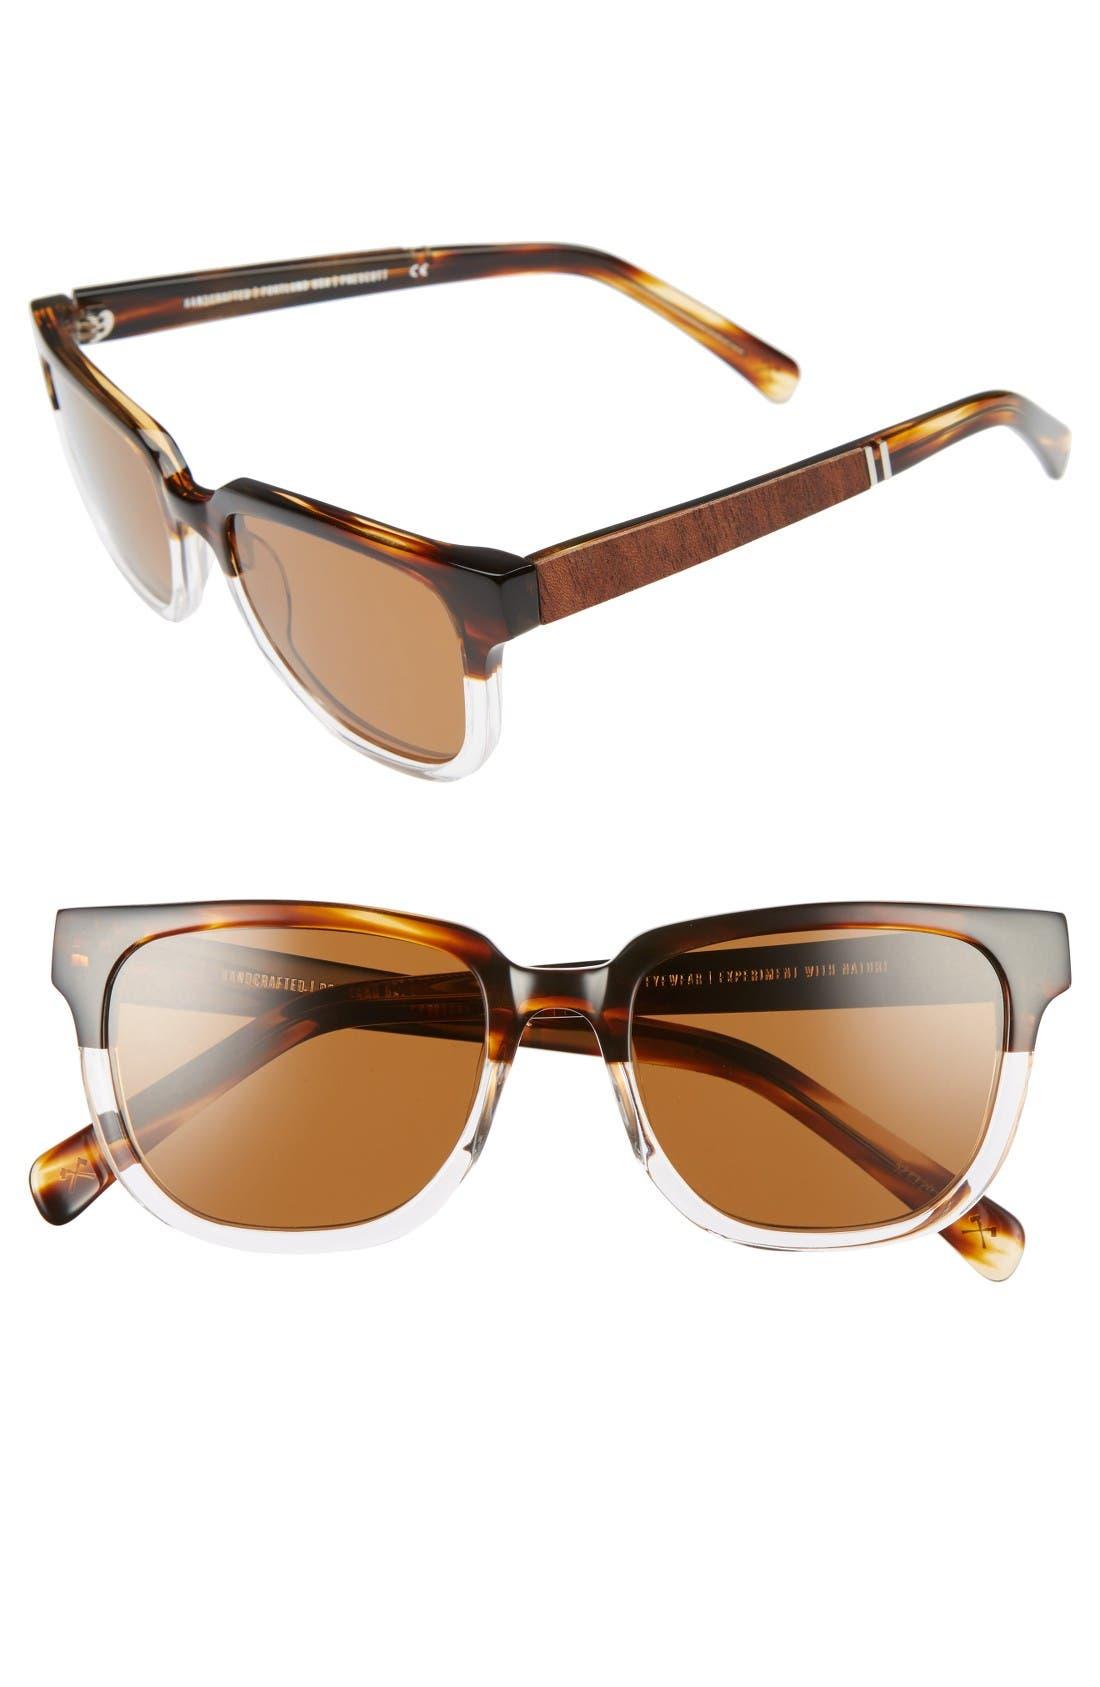 SHWOOD Prescott 52mm Polarized Acetate & Wood Sunglasses